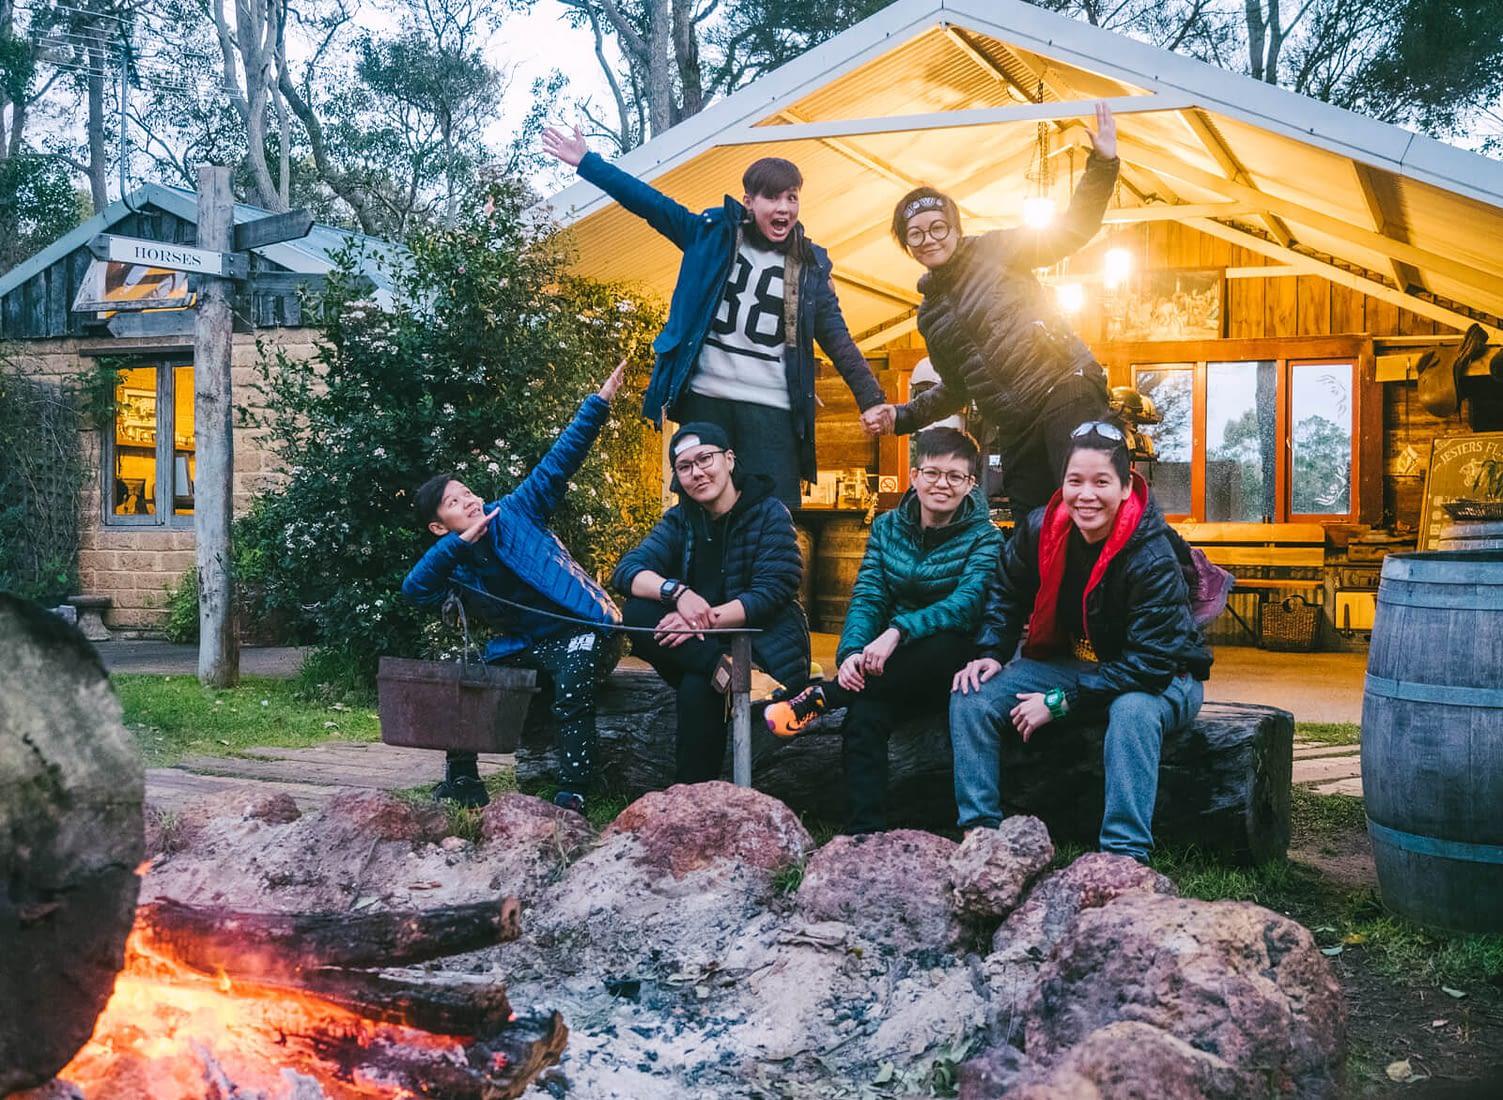 Perth, Australia - Jesters Flat - Wefie around the campfire